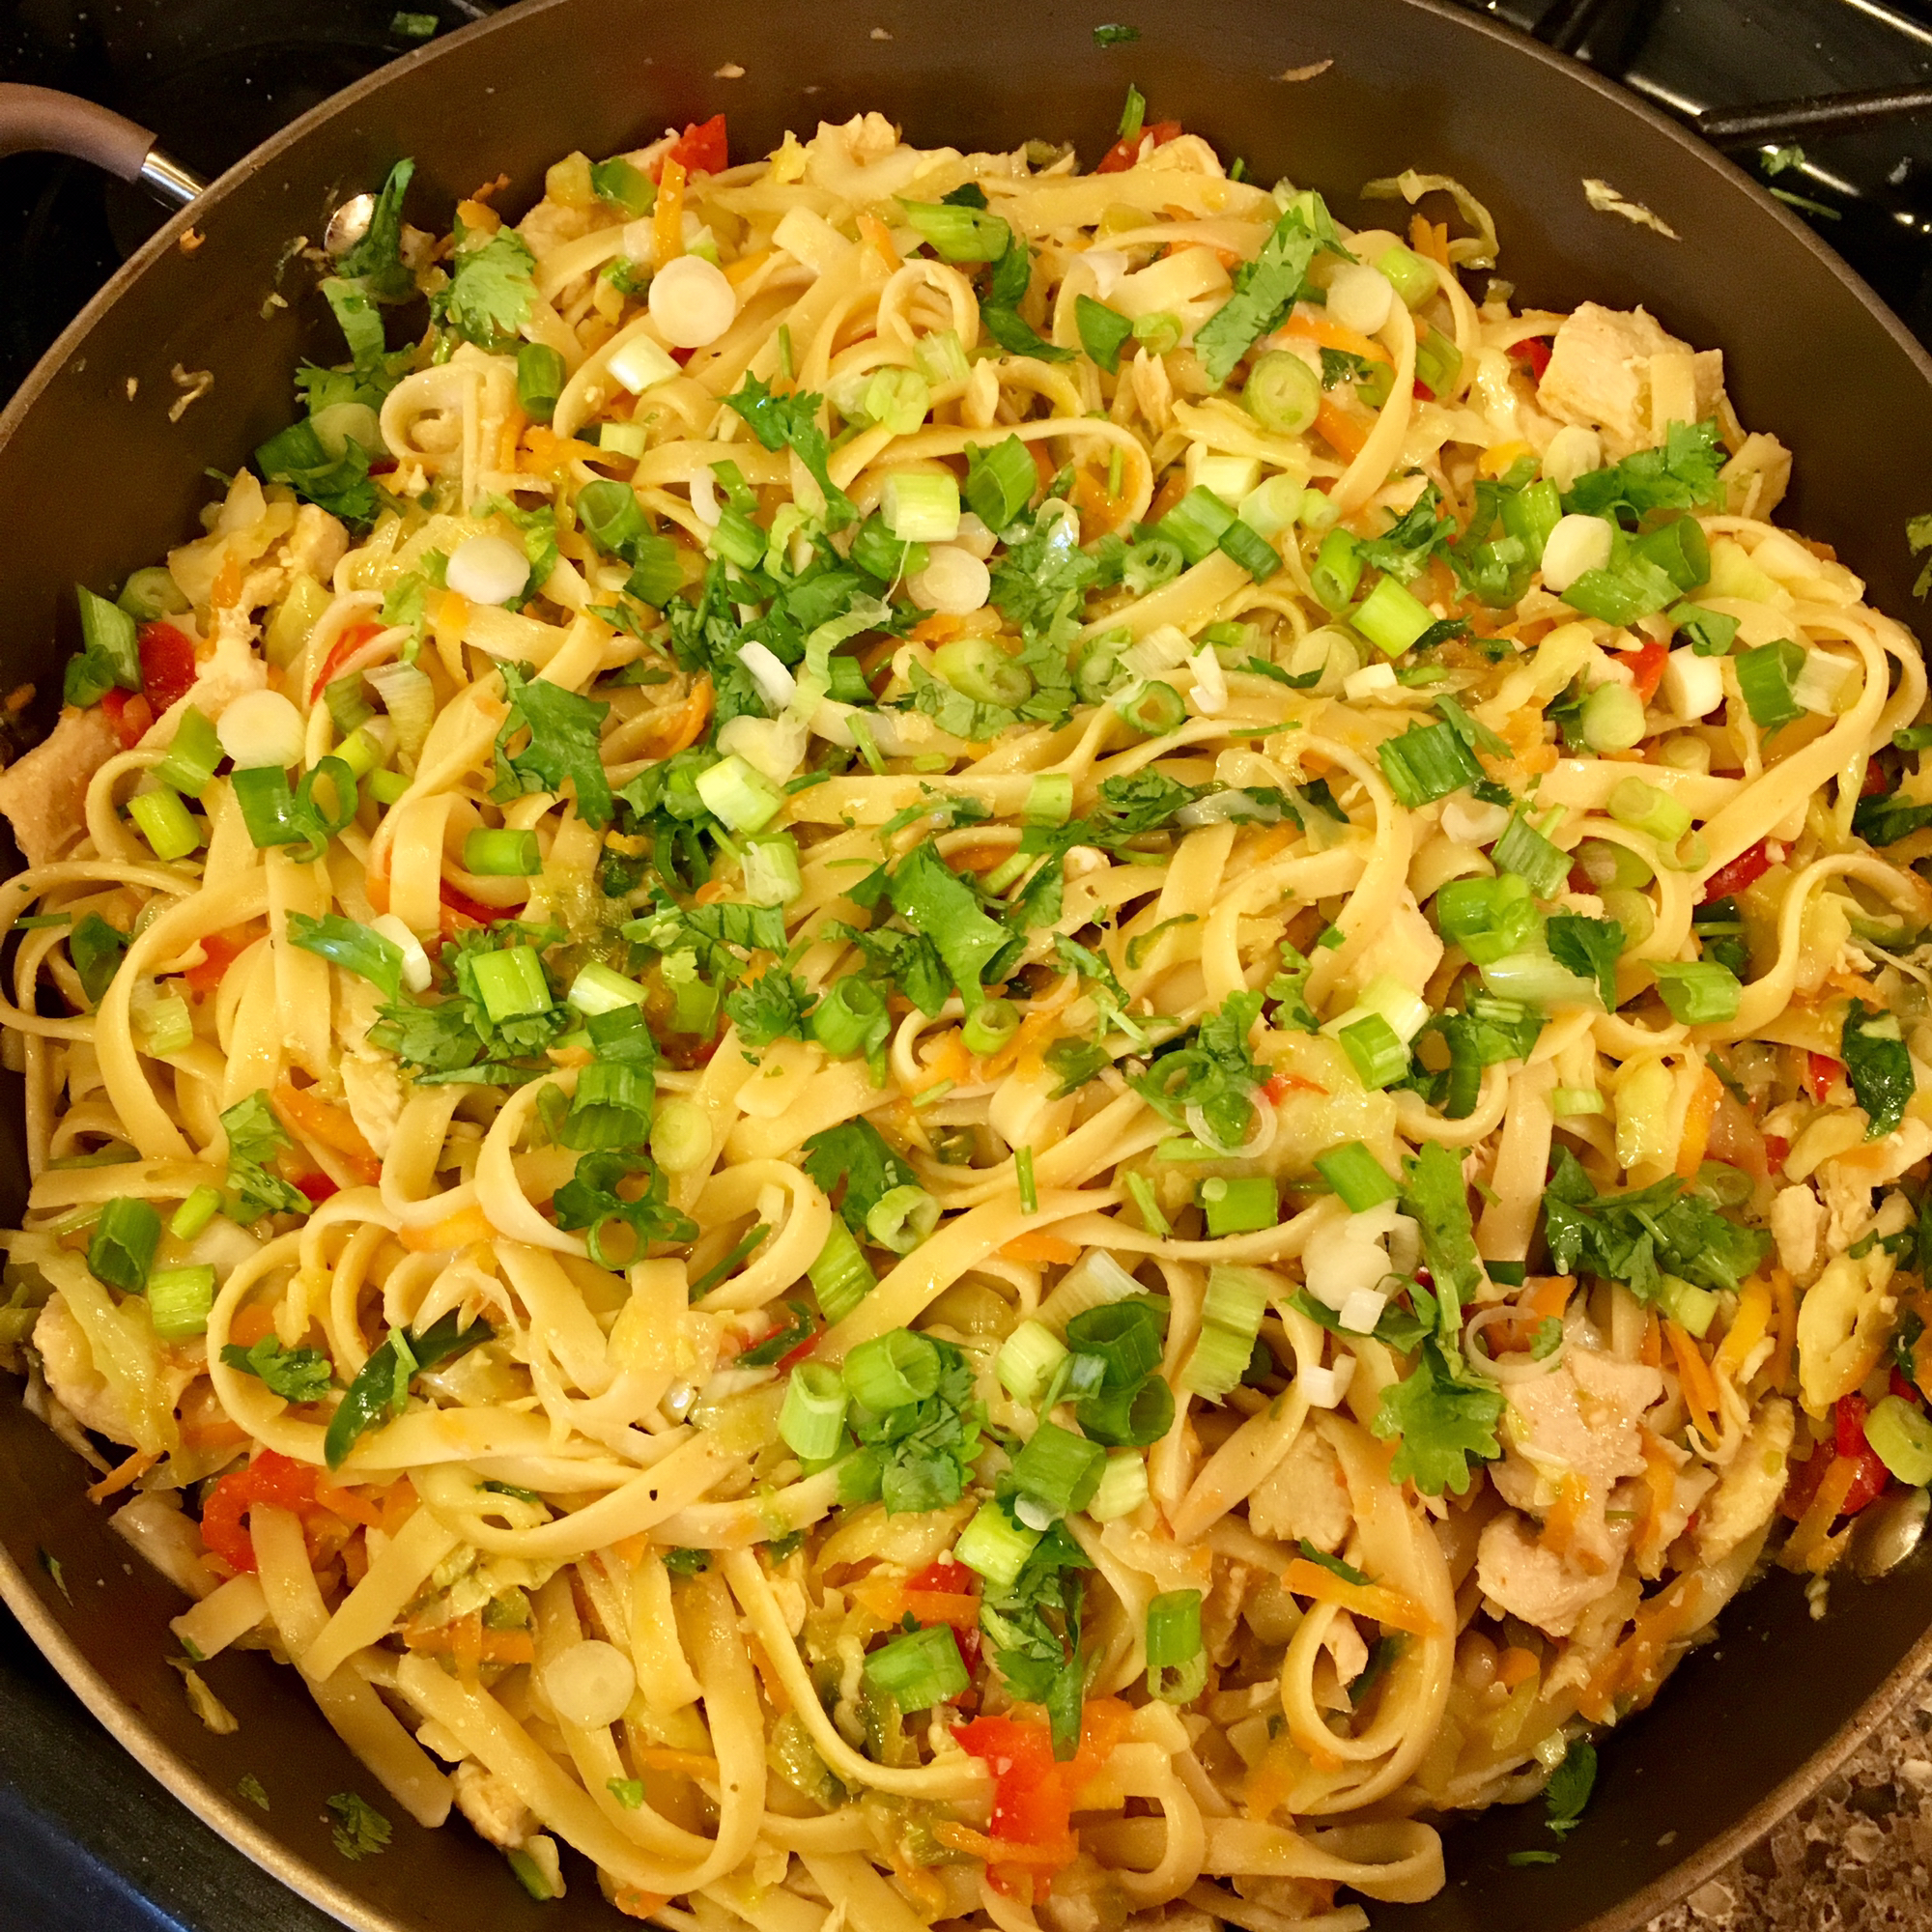 Spicy Chicken Noodles Val C.